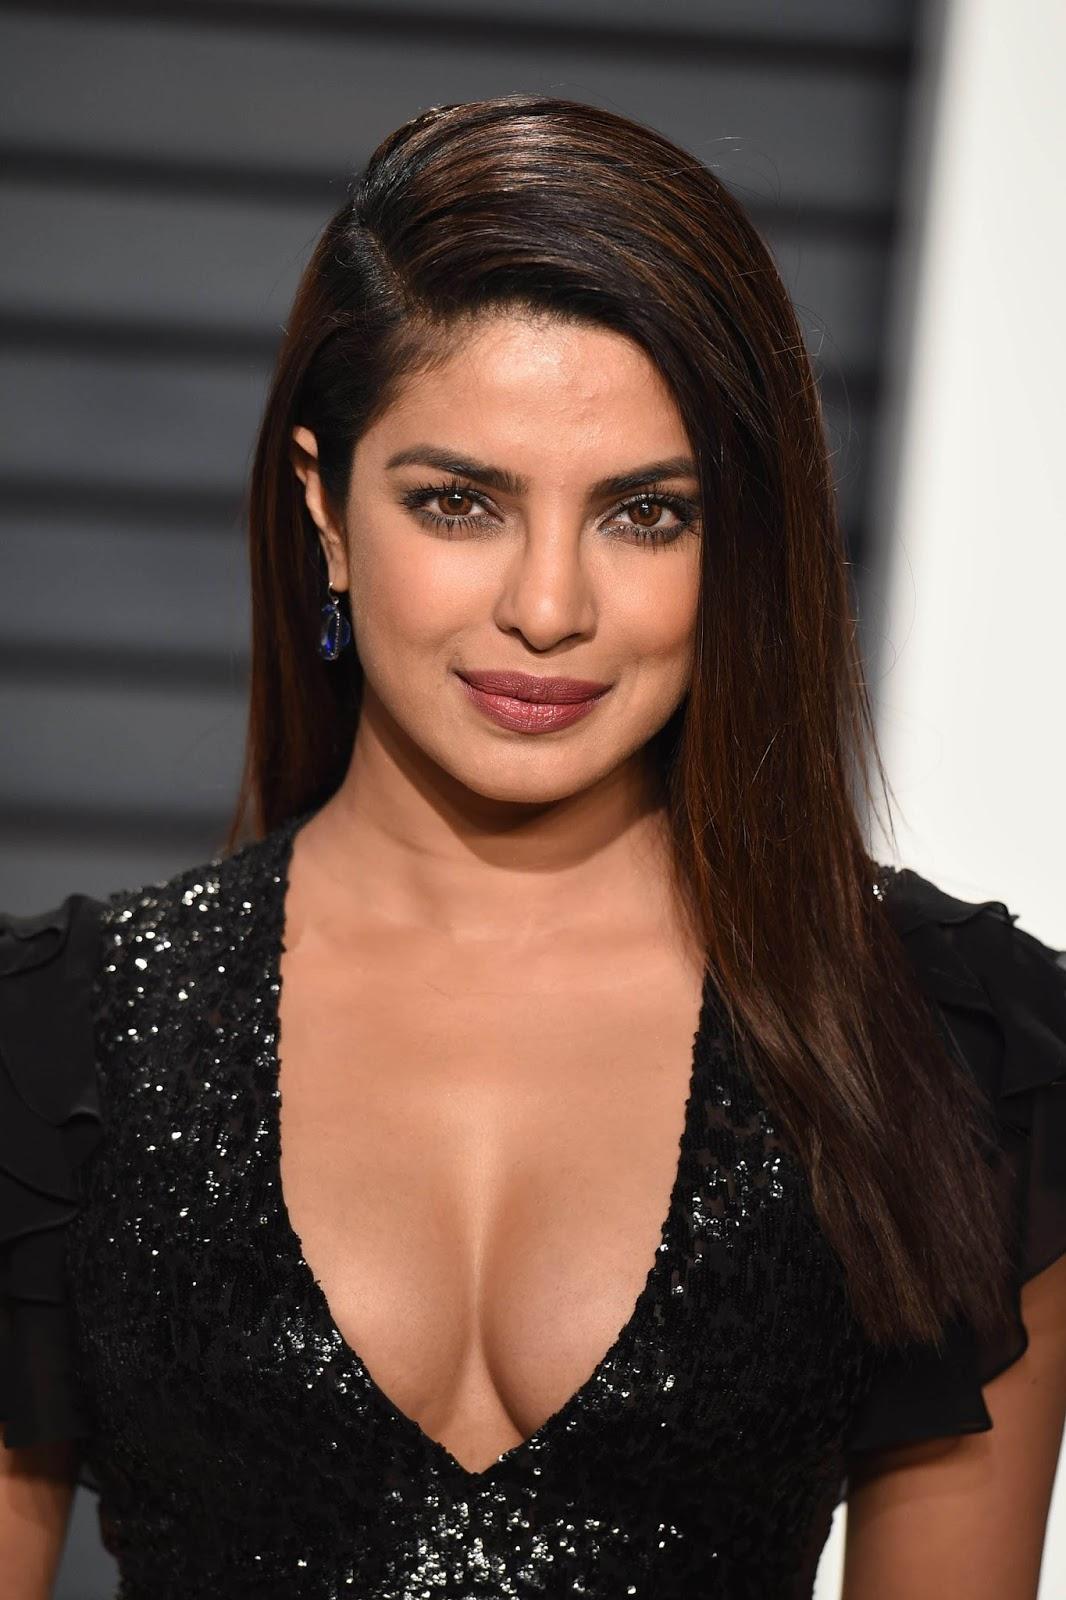 Priyanka Chopra Sexy Picture Sexy Picture